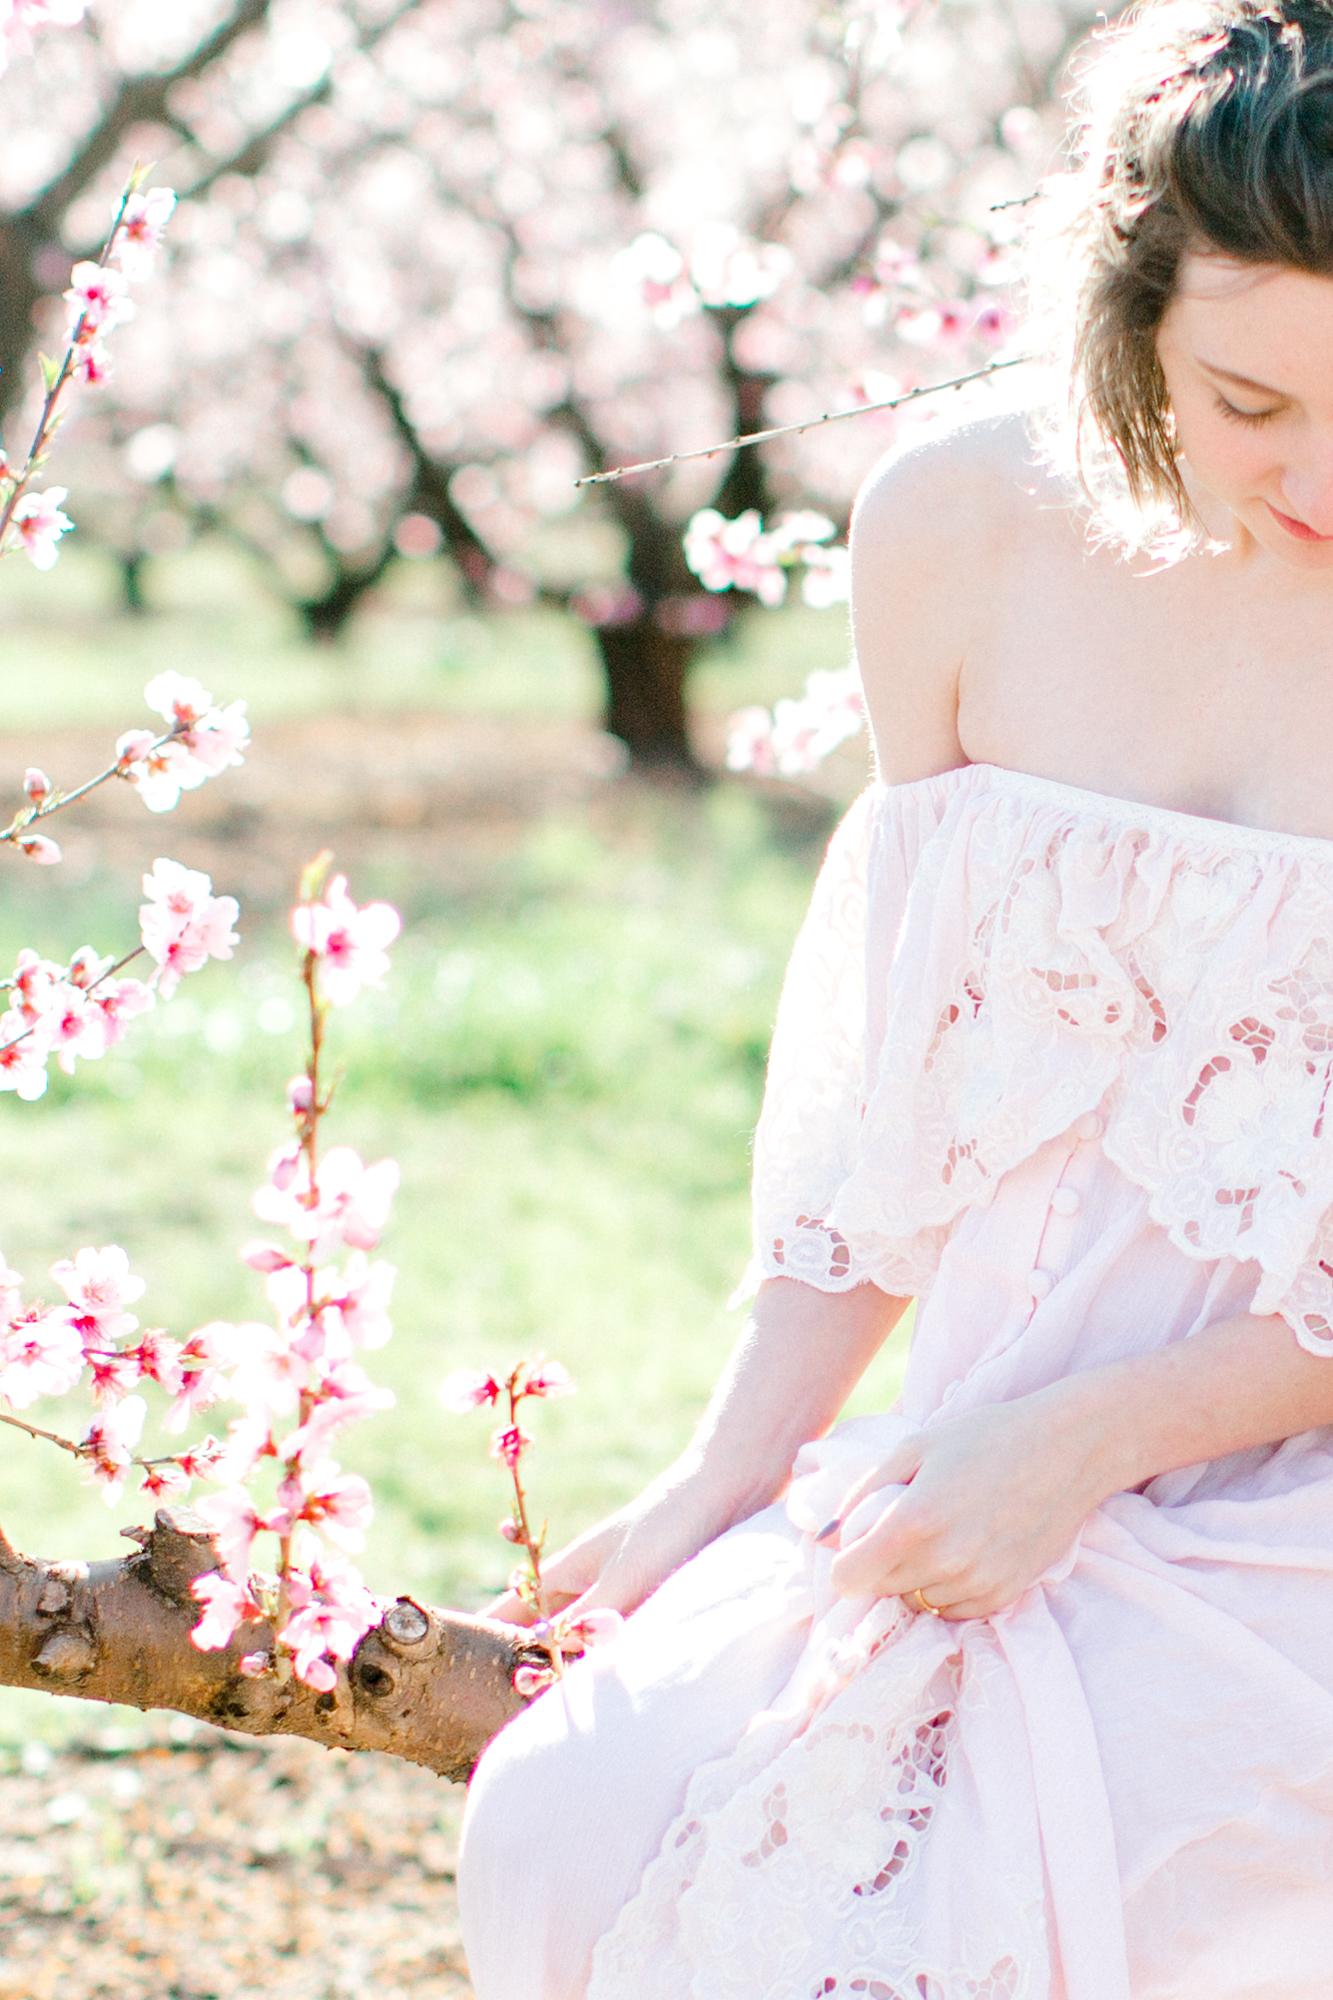 four corners photography peach blossom mini sessions peach blossom maternity session (16 of 25).jpg